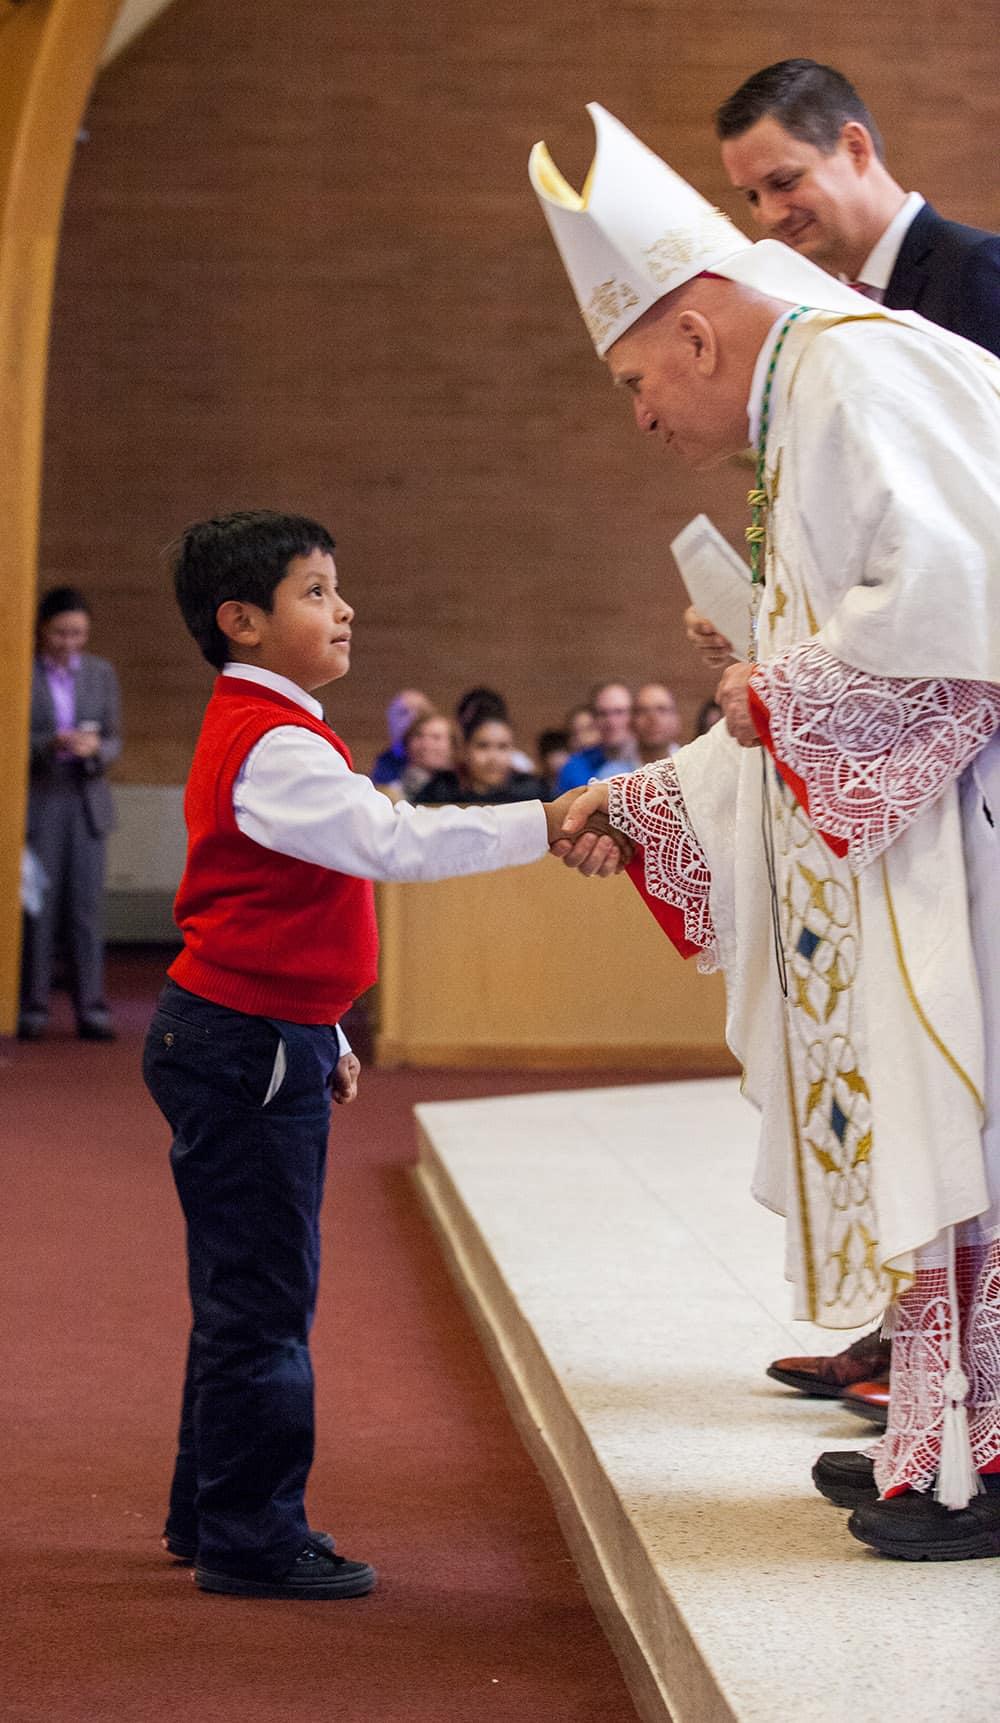 Archbishop Samuel J Aquila celebrates mass and visits the school, February 2, 2017: Sacred Heart of Jesus school Boulder, Colorado Photo by Andrew Wright/Denver Catholic